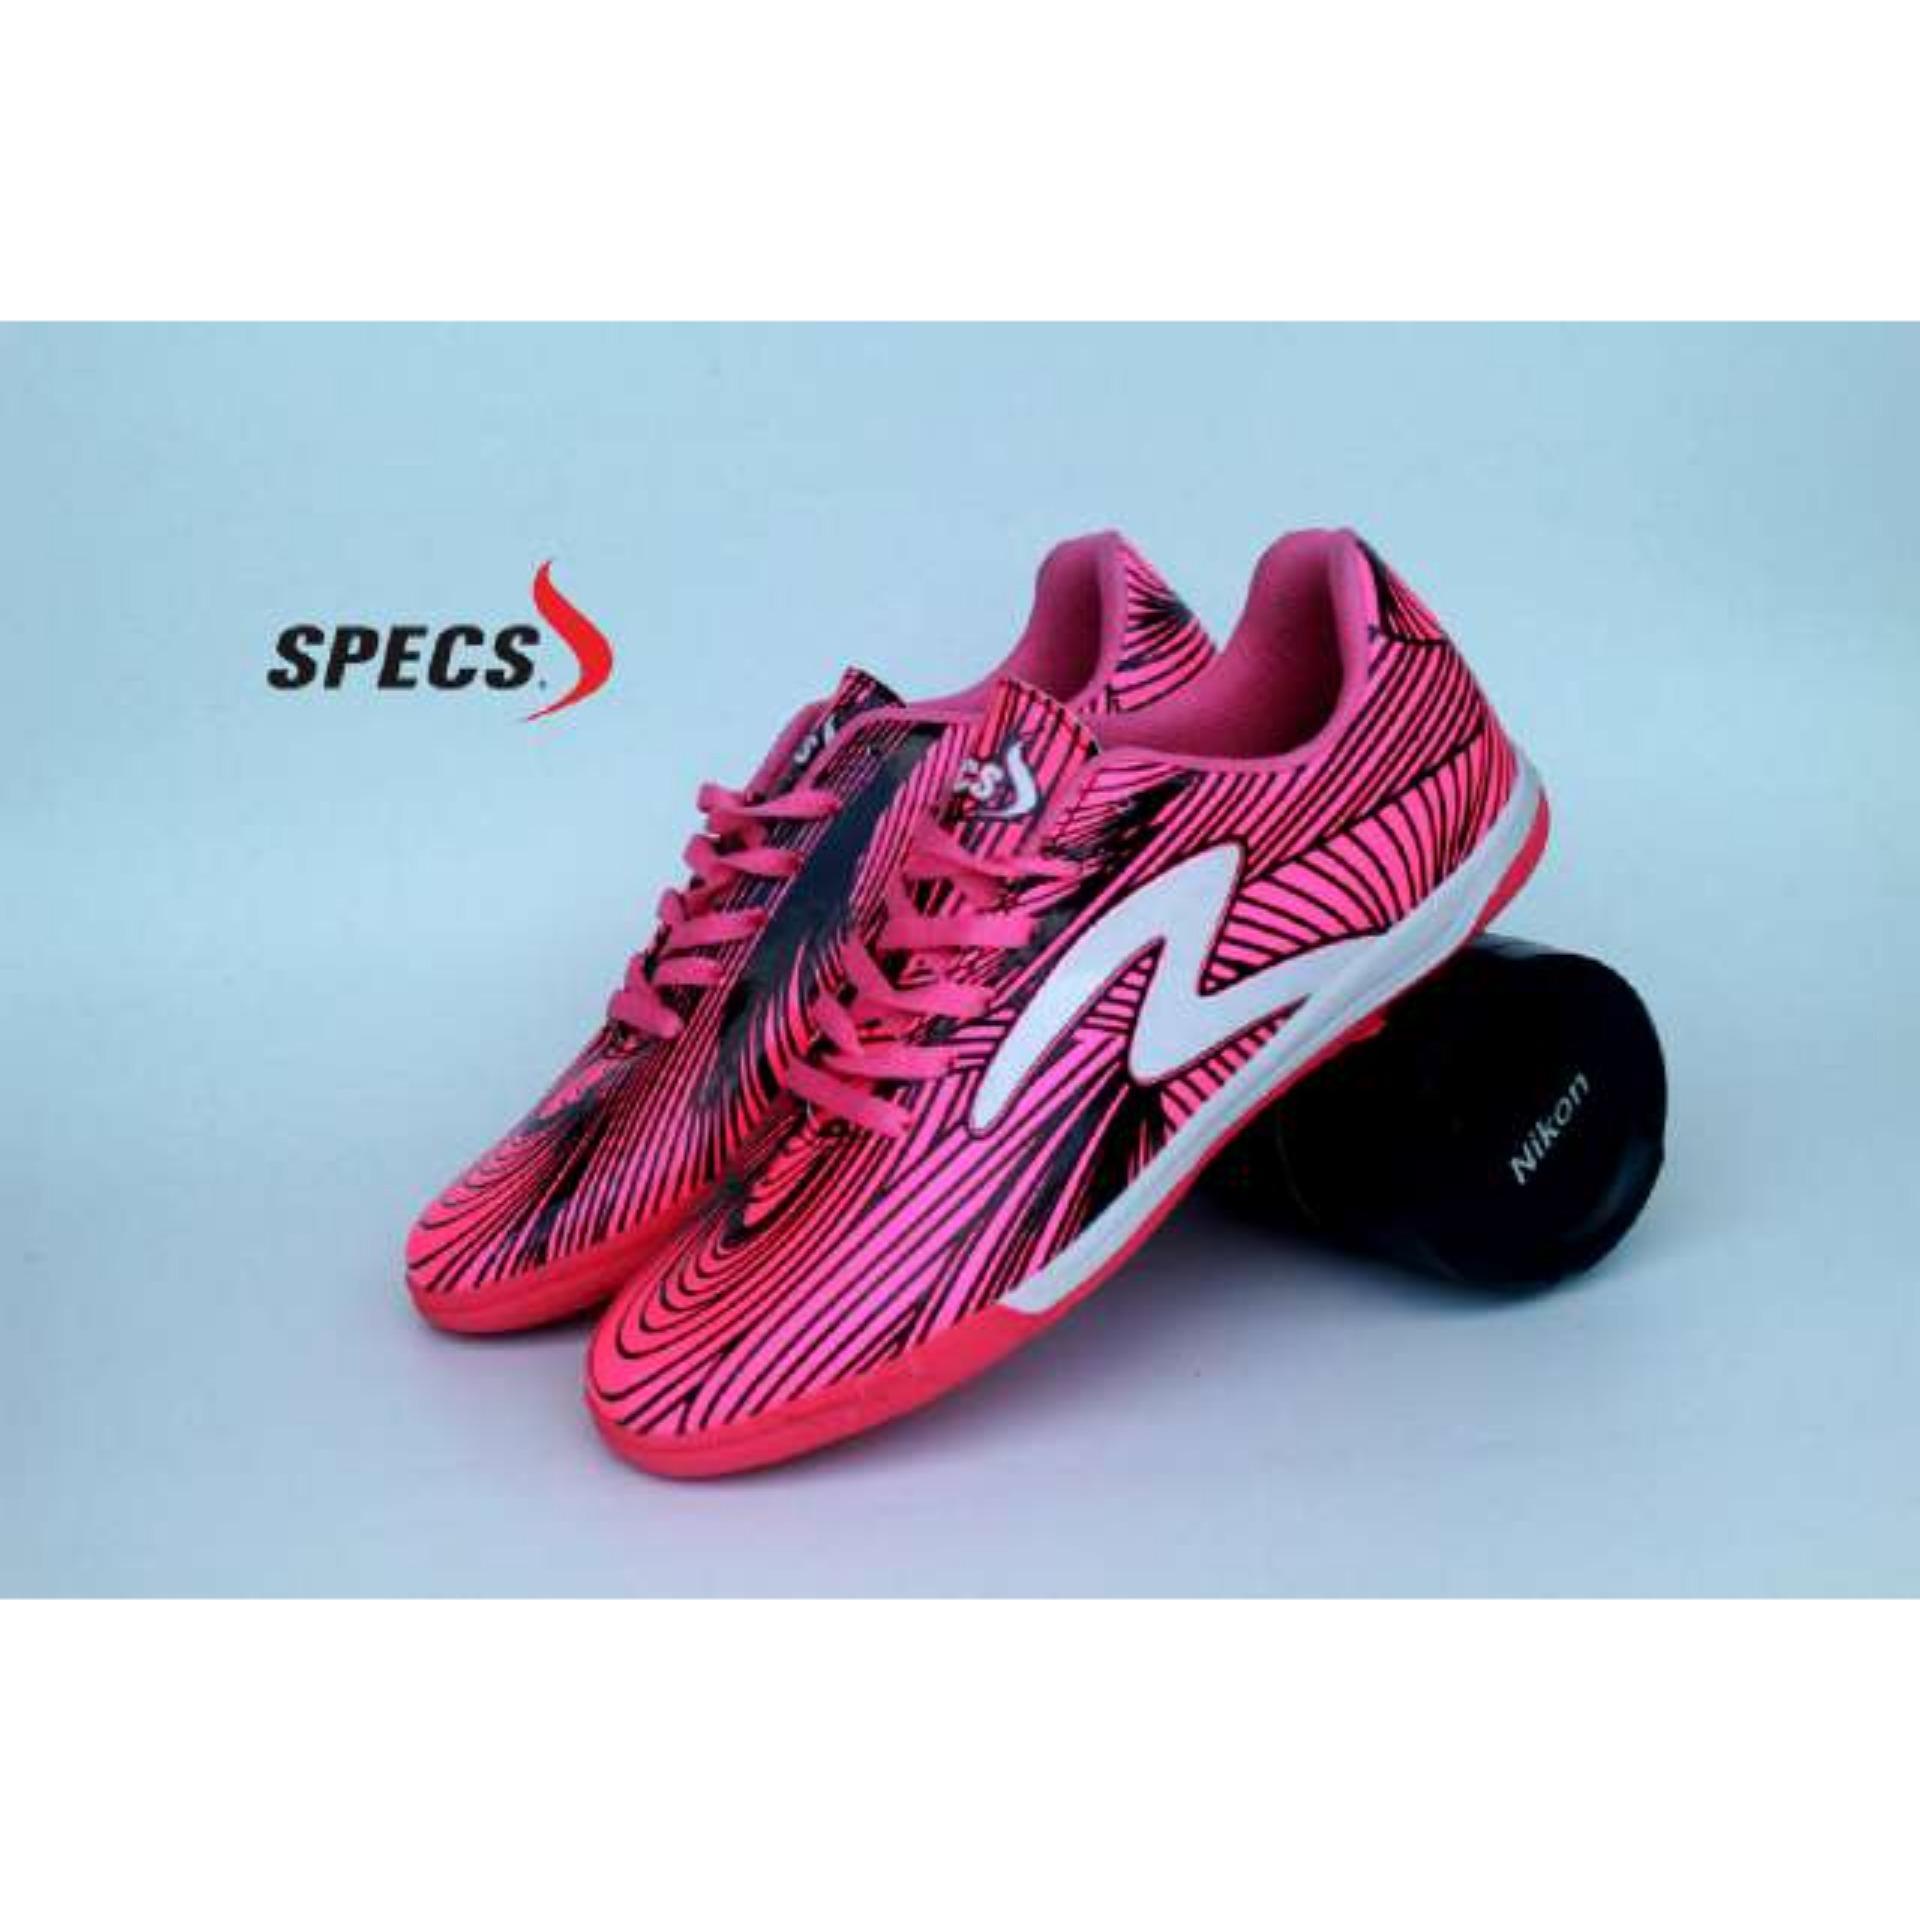 Sepatu Olahraga Futsal Specs Baricida Murah Terlaris Sepatu Futsal Keren